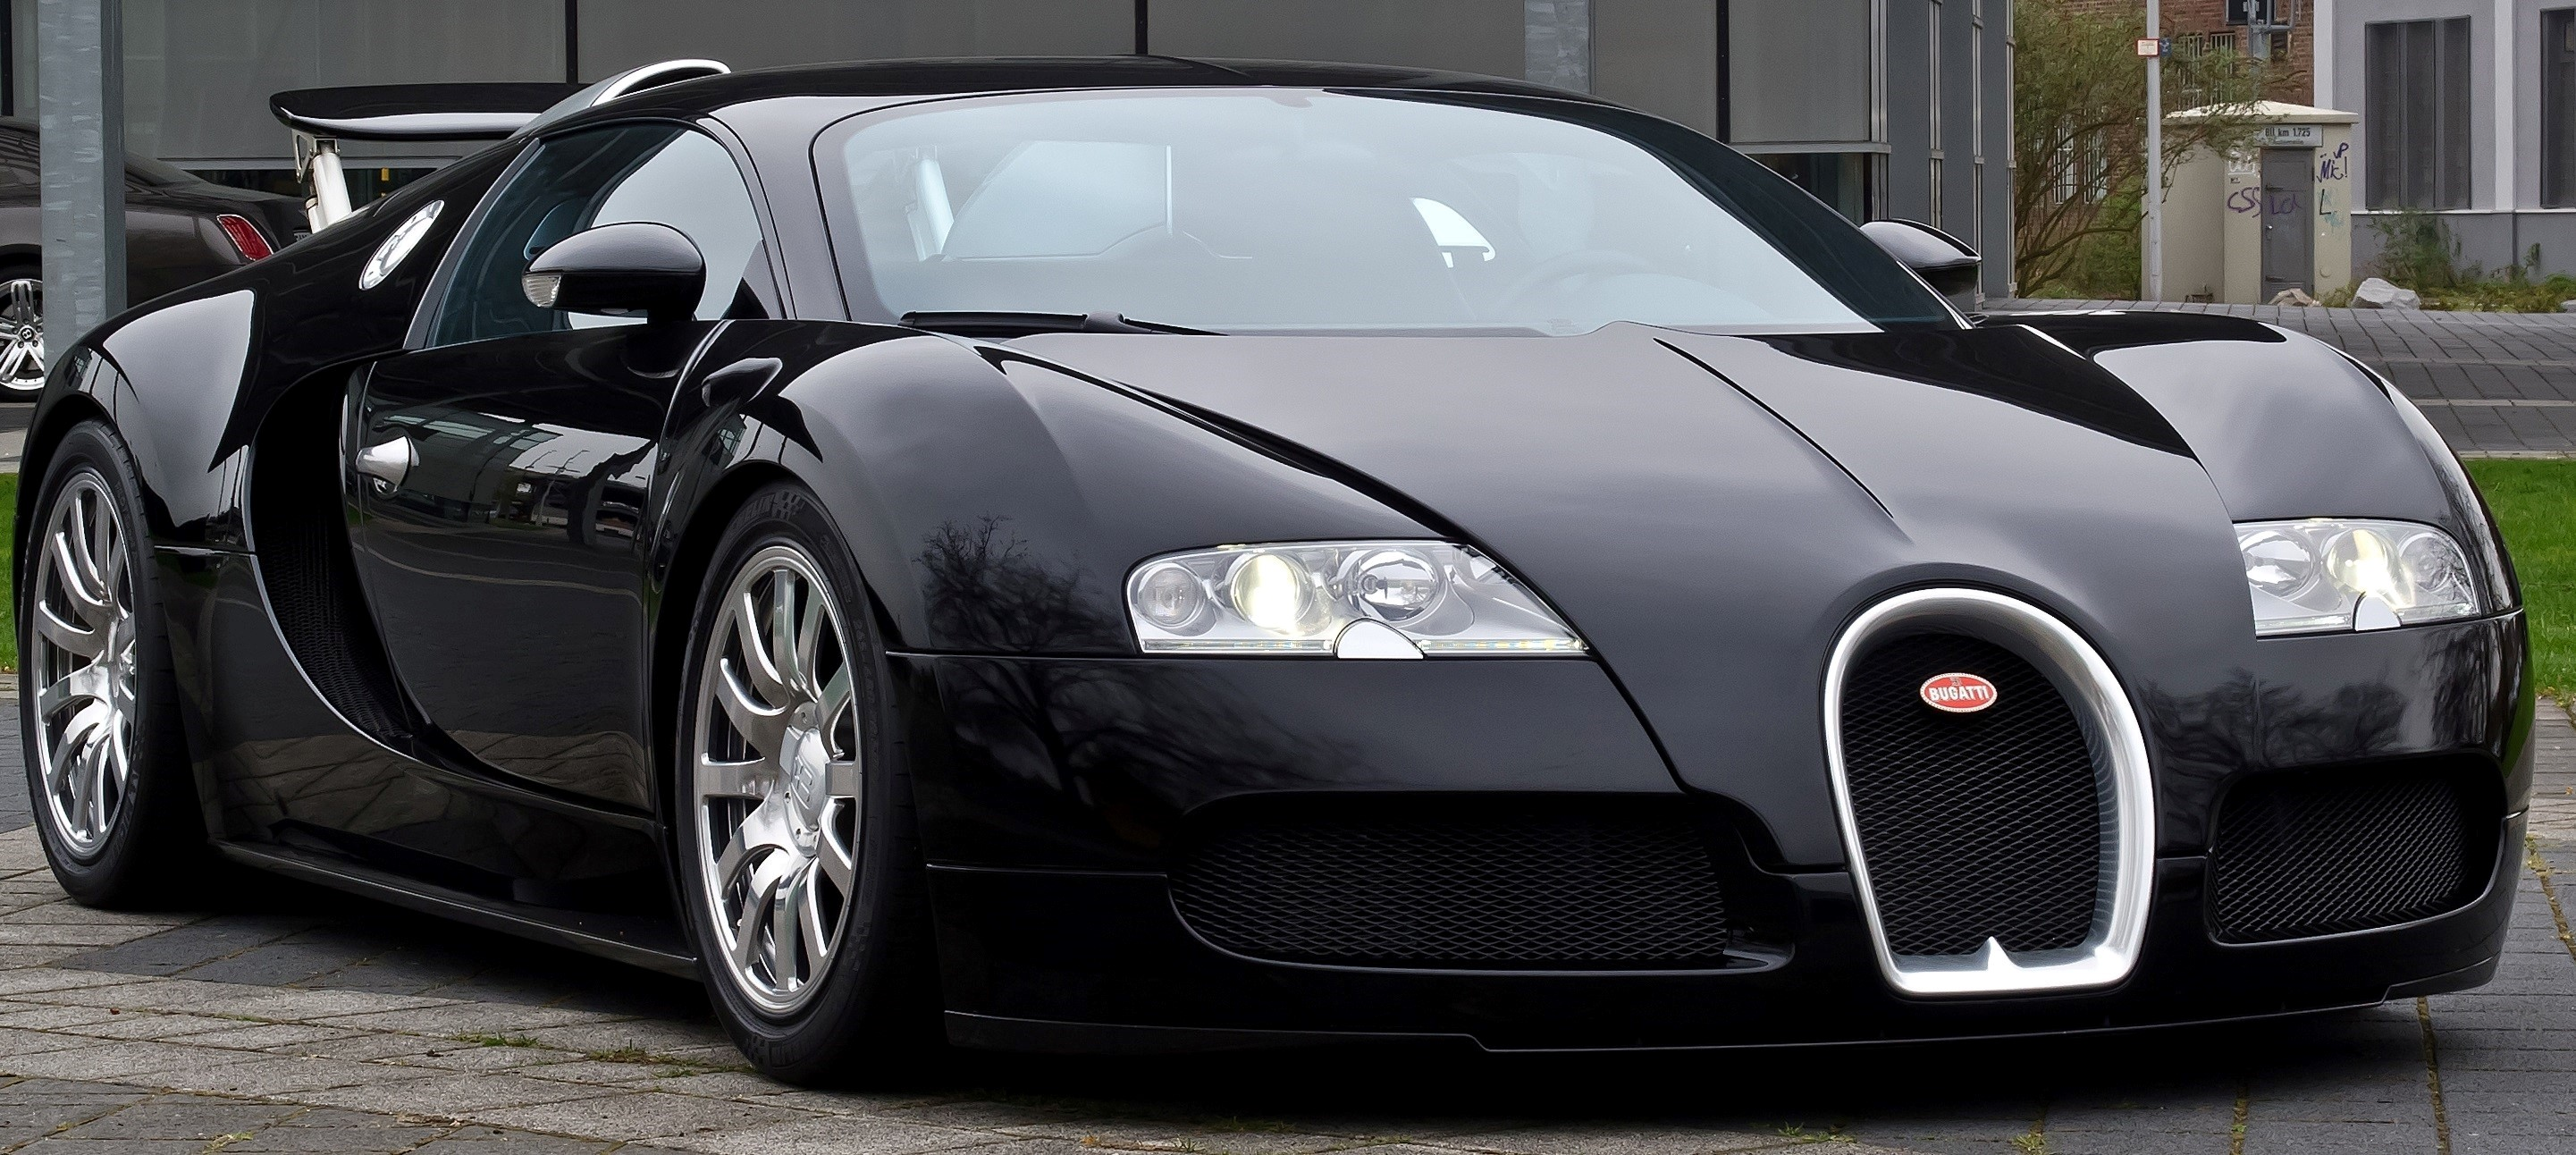 Download New Black Bugatti Veyron Hd Supperb Cars Wallpaper Hd